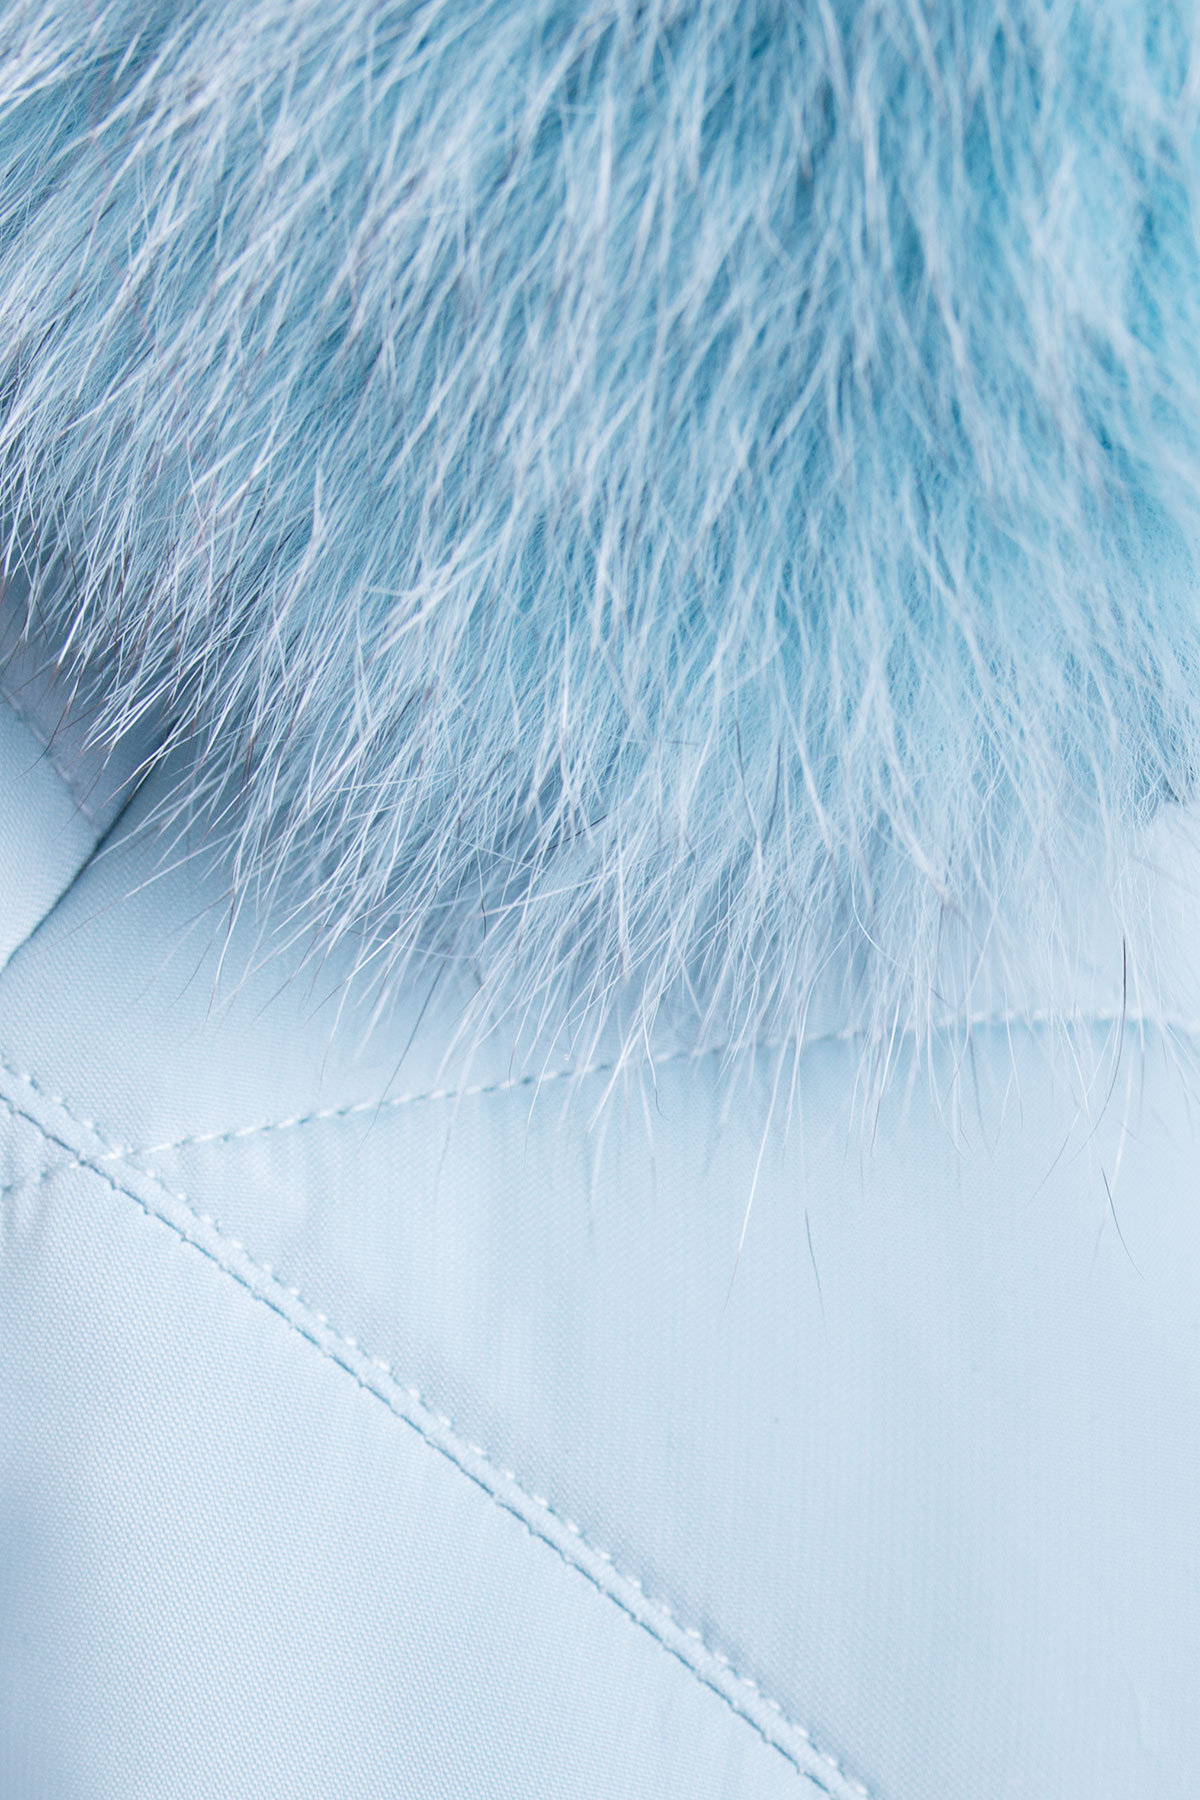 Короткий пуховик Ева 3112 АРТ. 16457 Цвет: Голубой - фото 4, интернет магазин tm-modus.ru